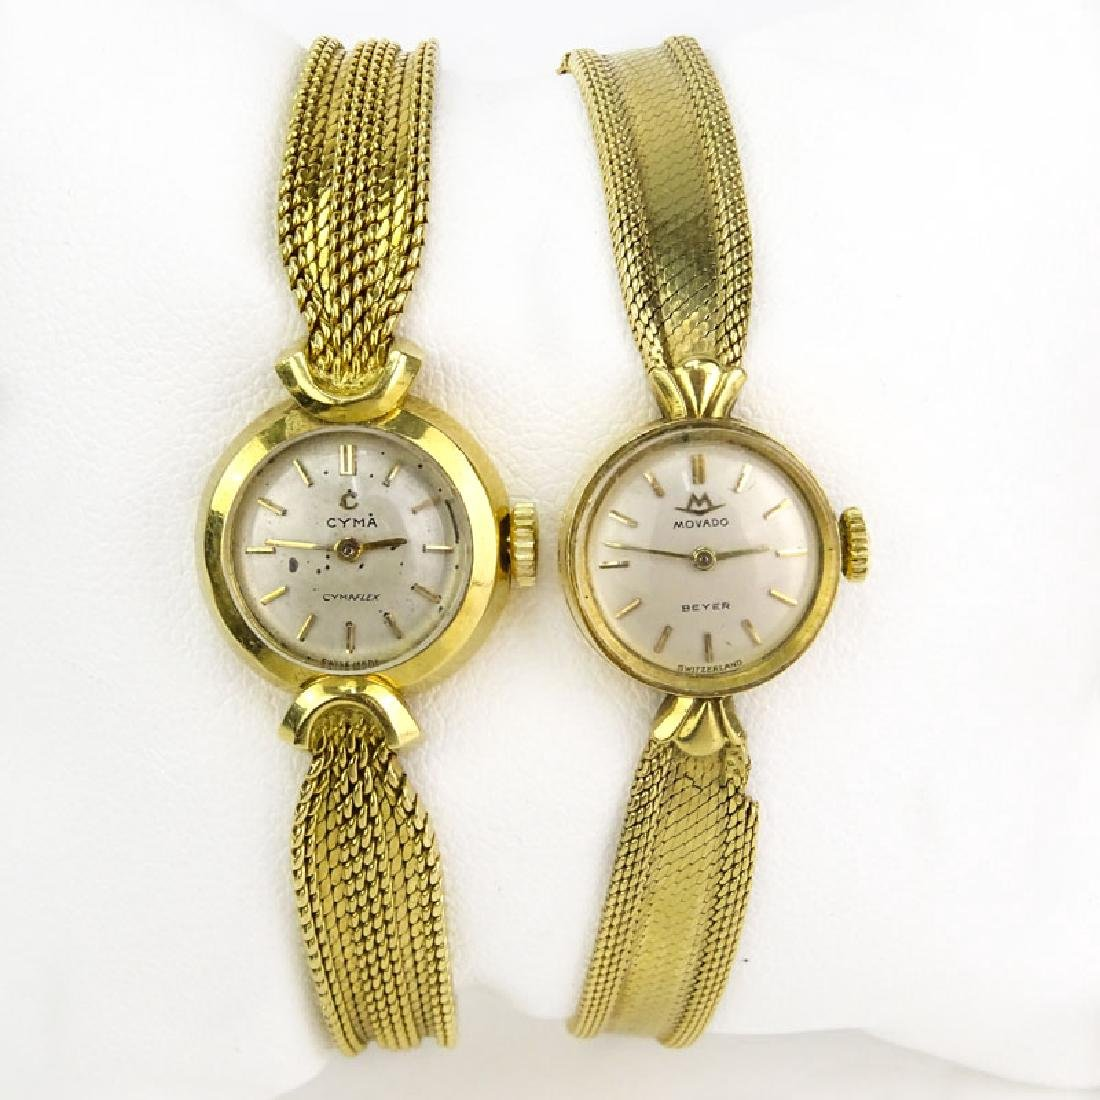 Lady's Vintage 18 Karat Yellow Gold Movado Bracelet